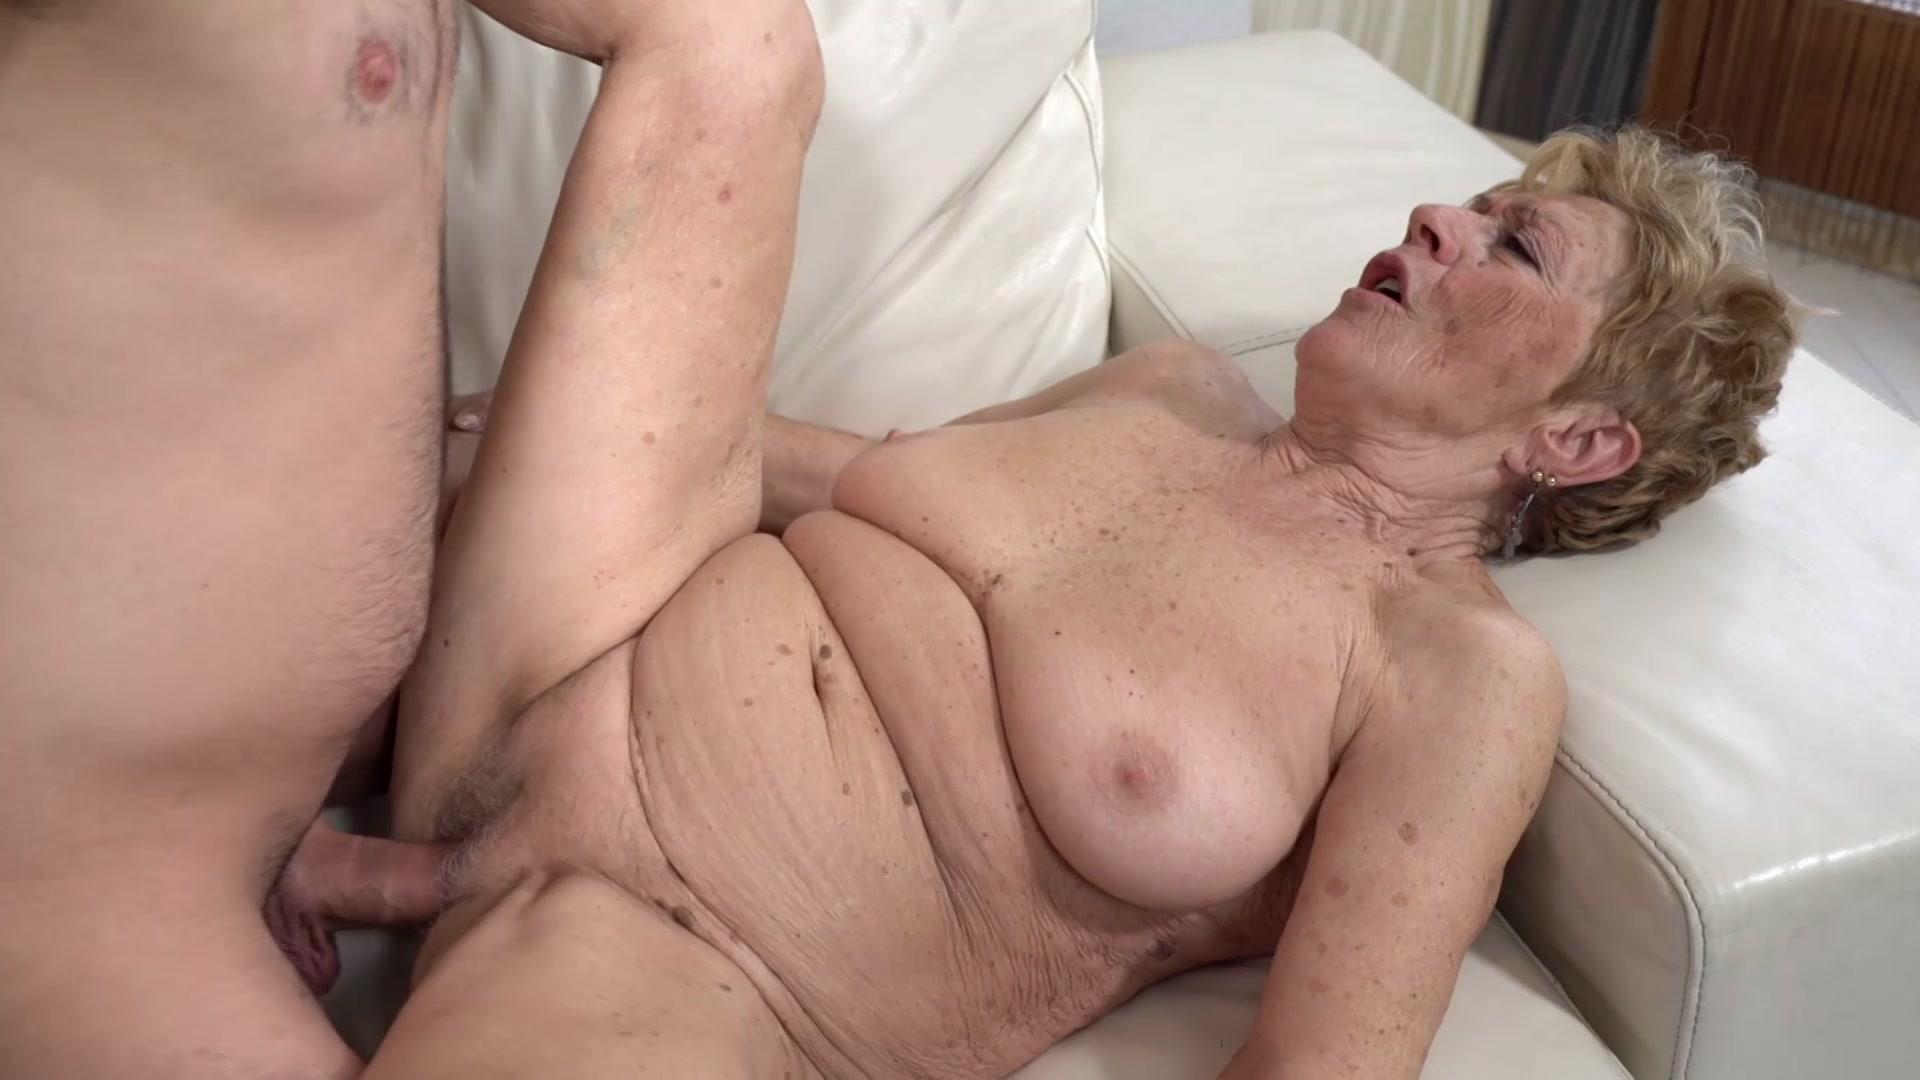 grandmas-having-sex-free-videos-senior